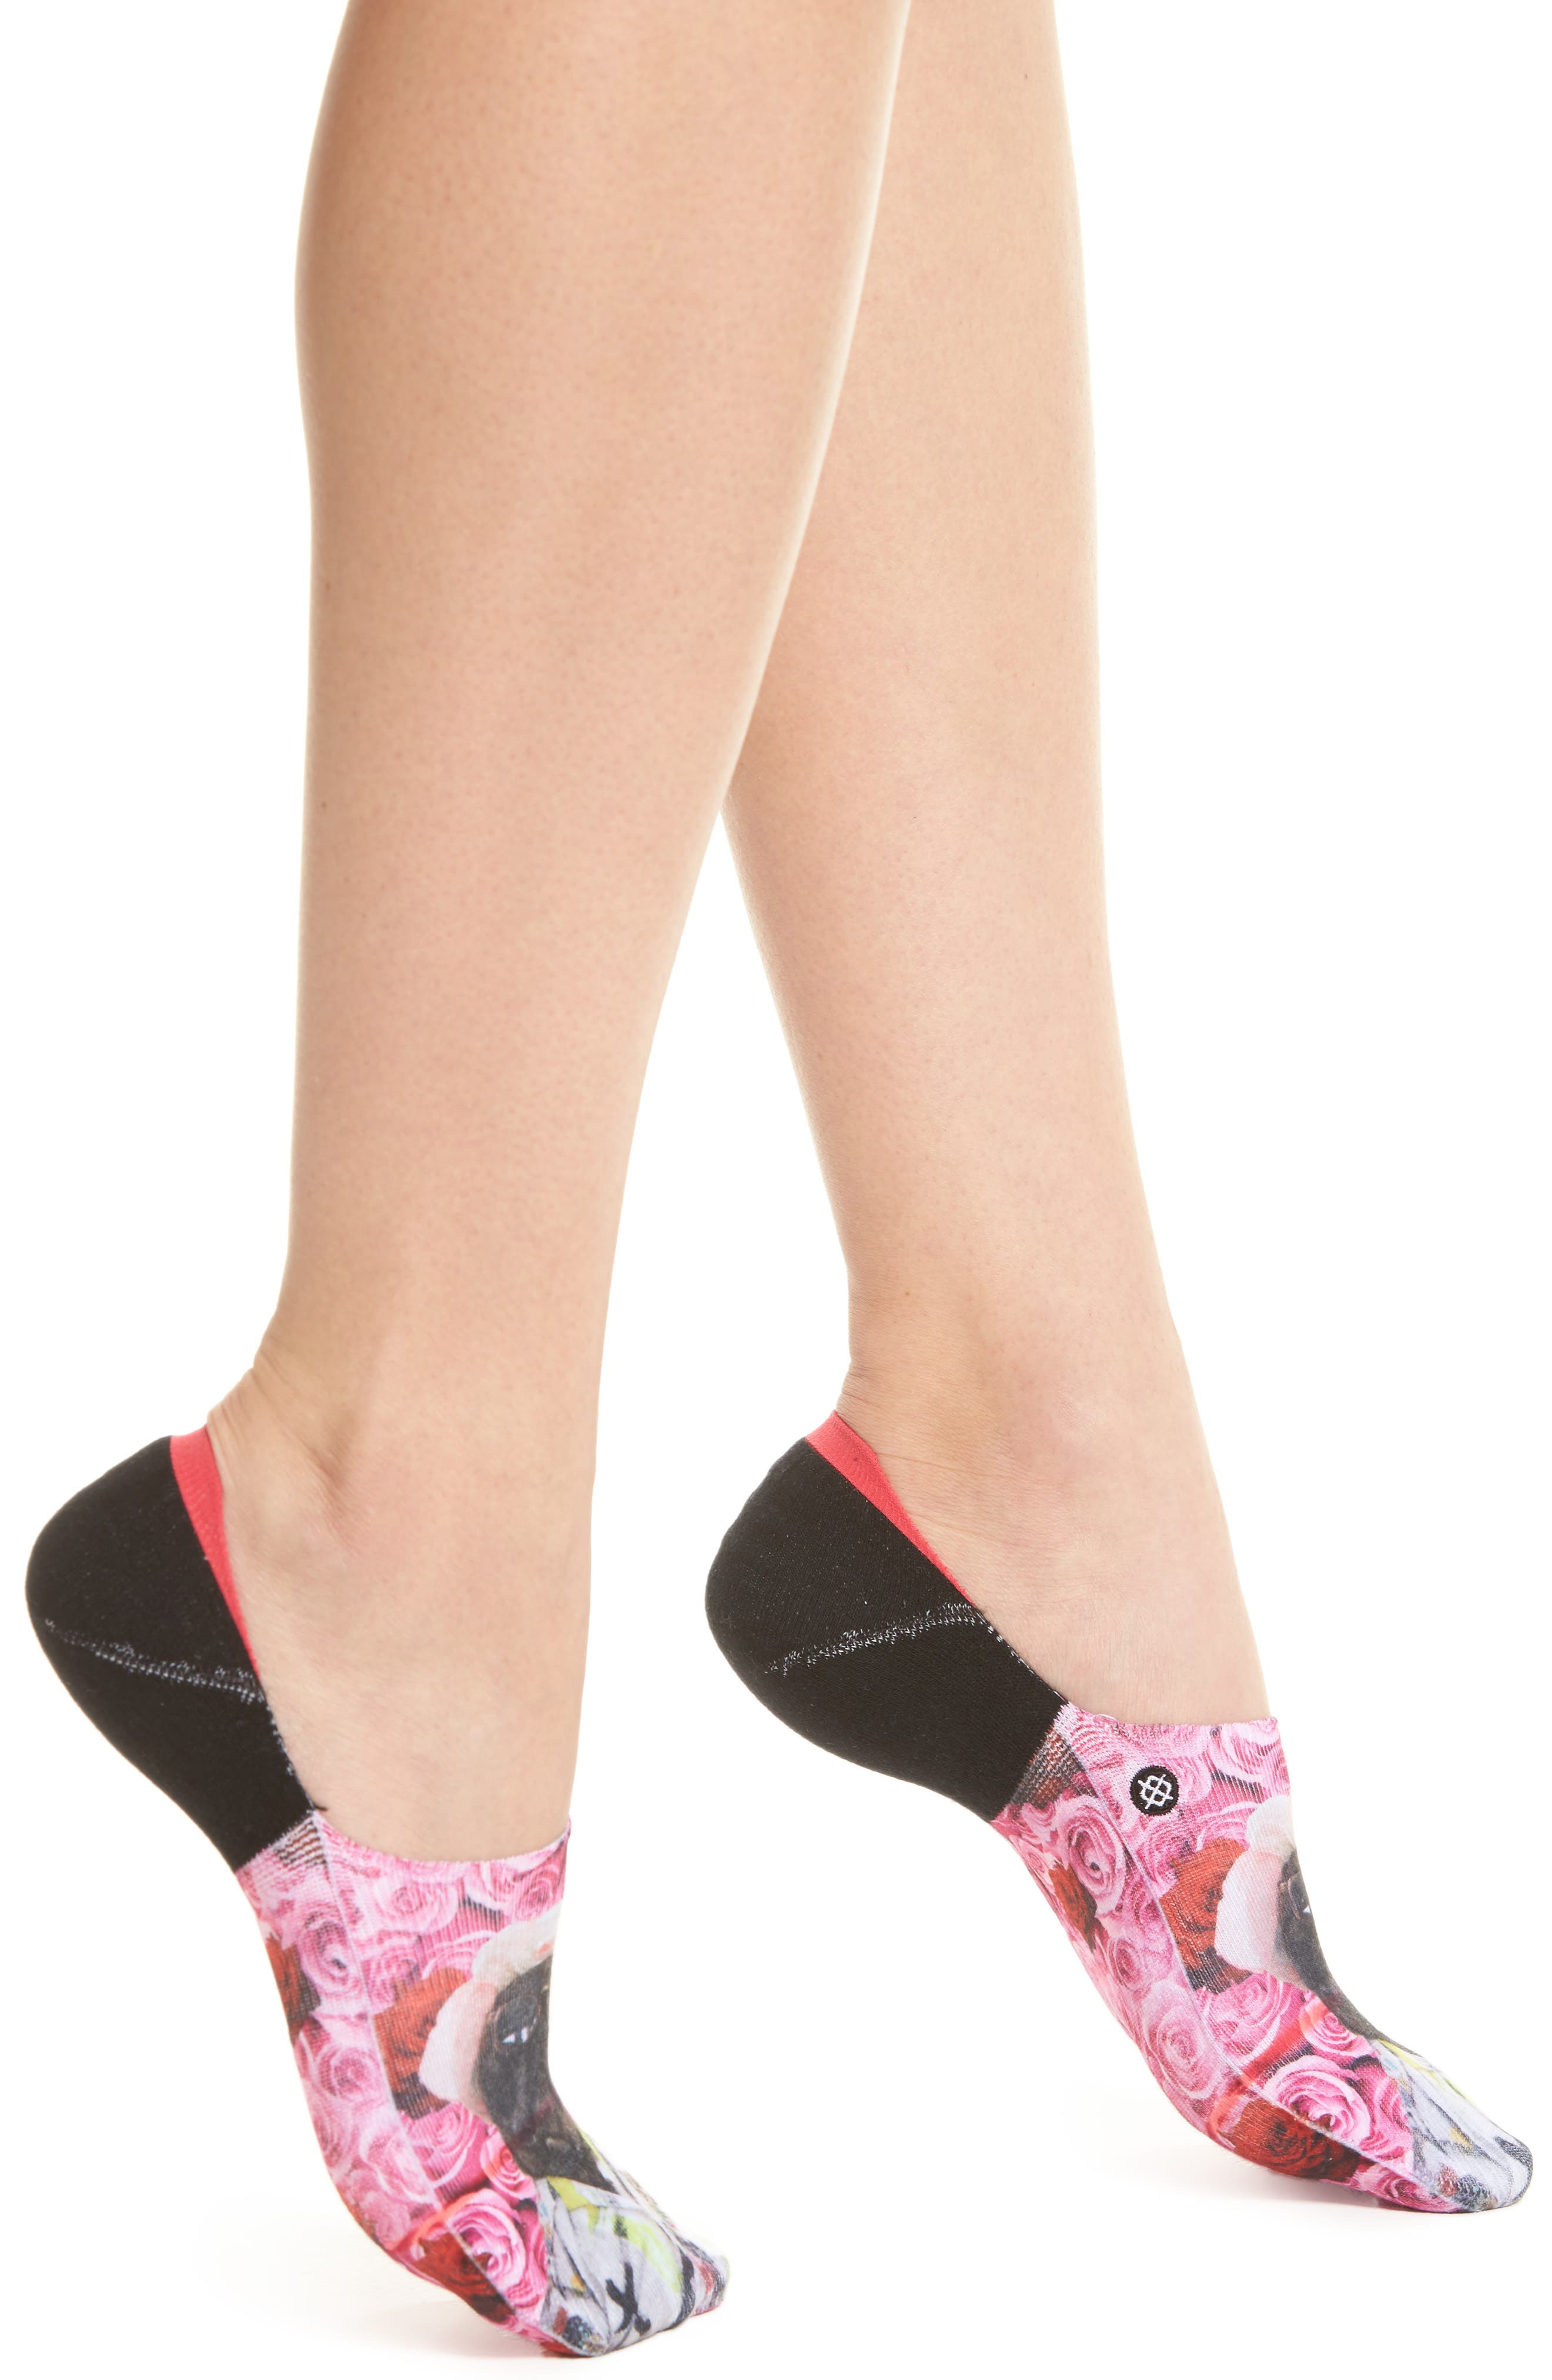 Call Me Later No-Show Socks,                             Main thumbnail 1, color,                             Black